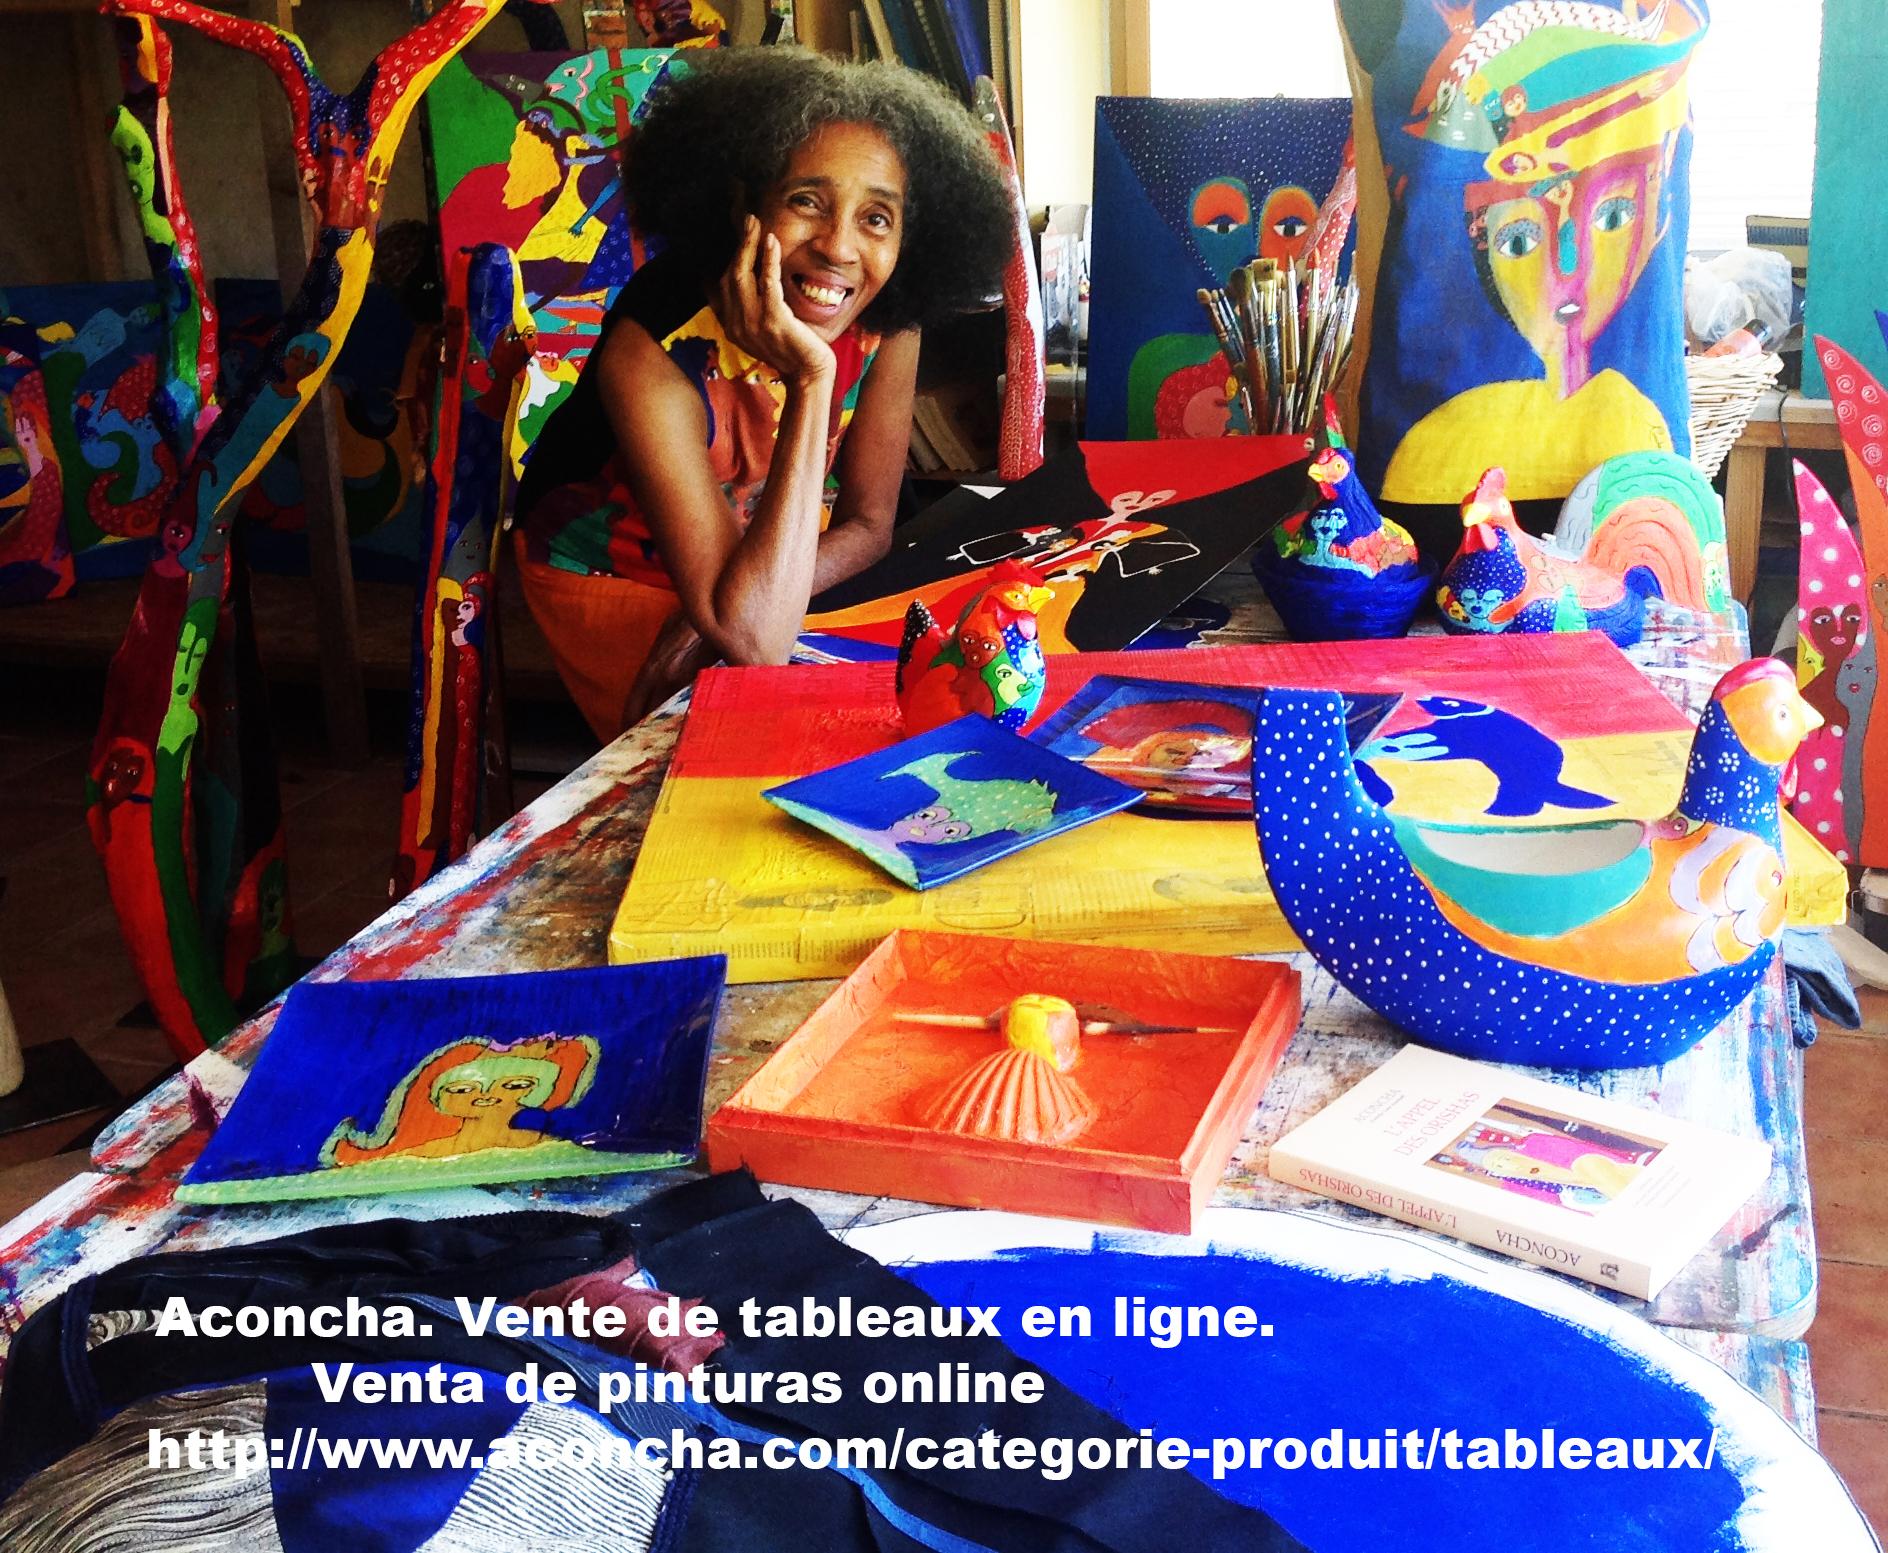 Aconcha vente en ligne